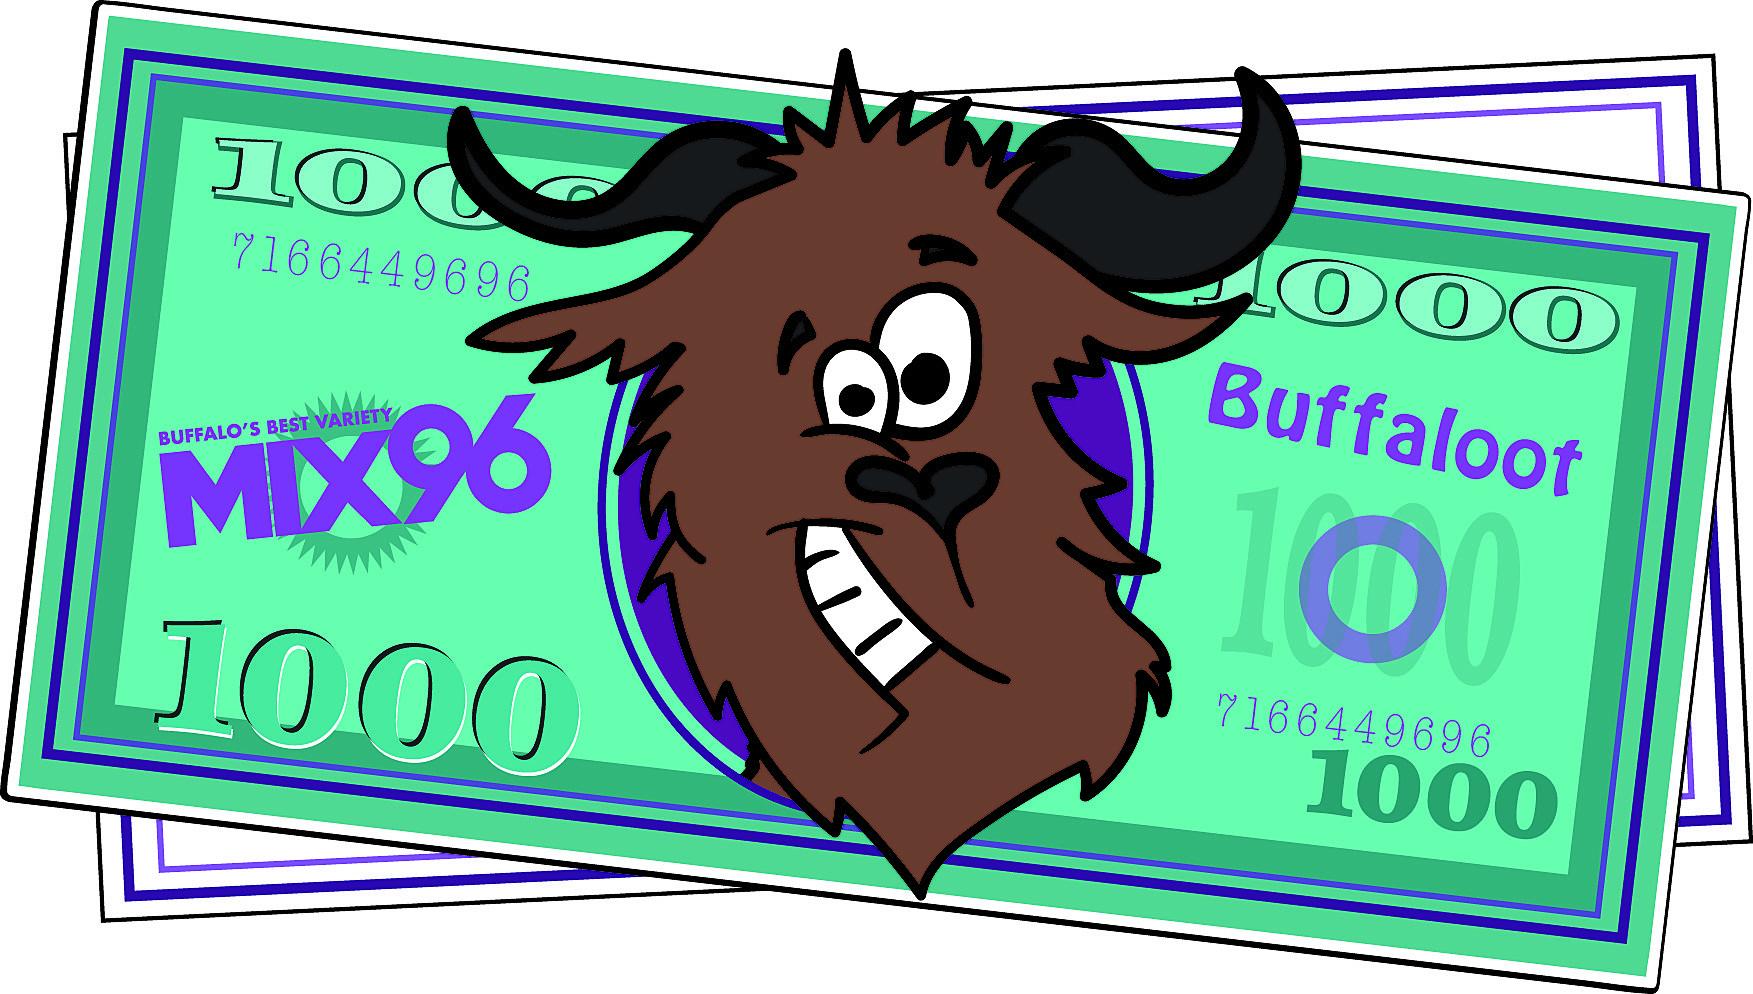 Buffaloot Logo